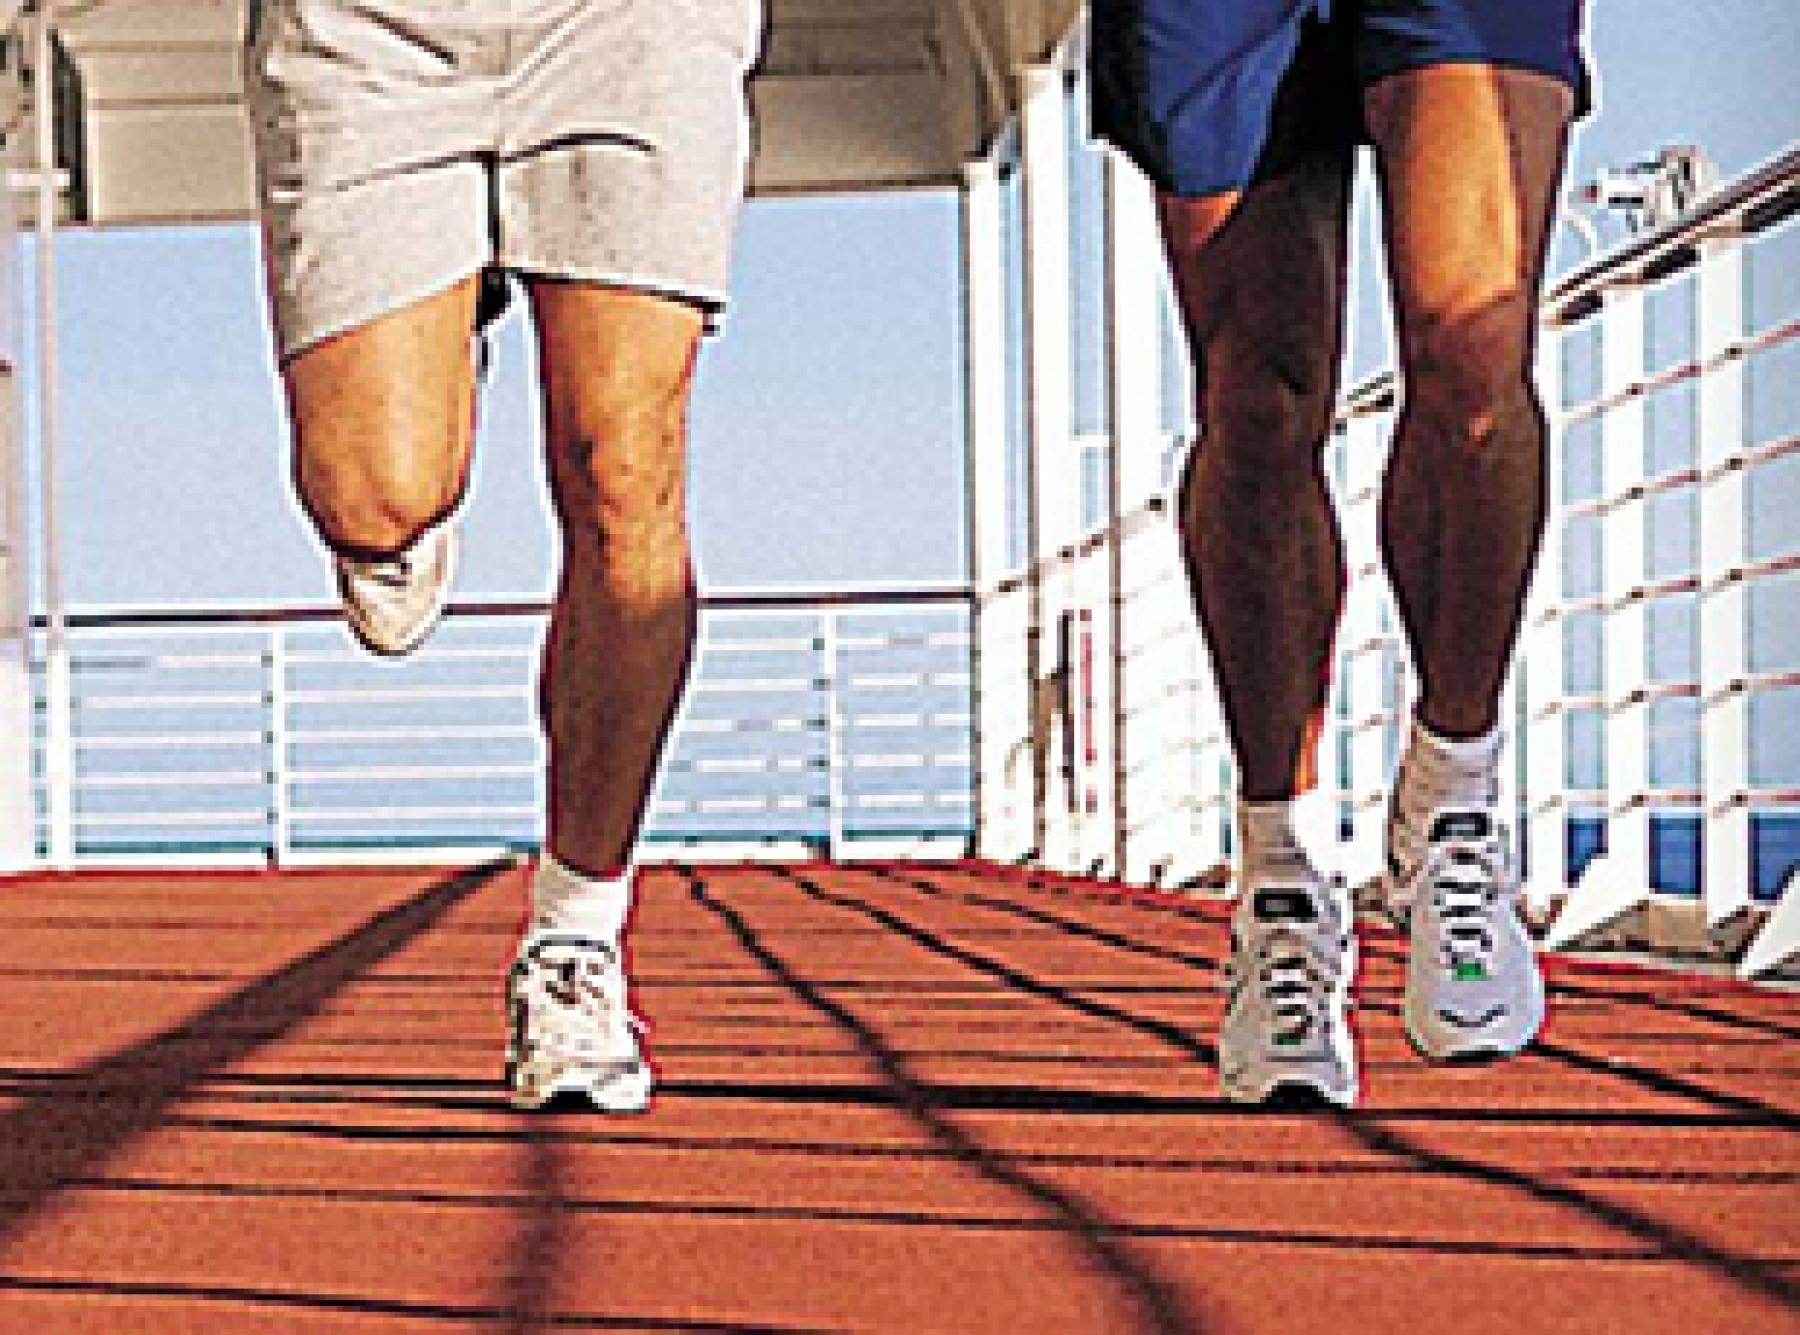 Norwegian Cruise Line Norwegian Spirit Exterior Jogging and Walking Track.jpg